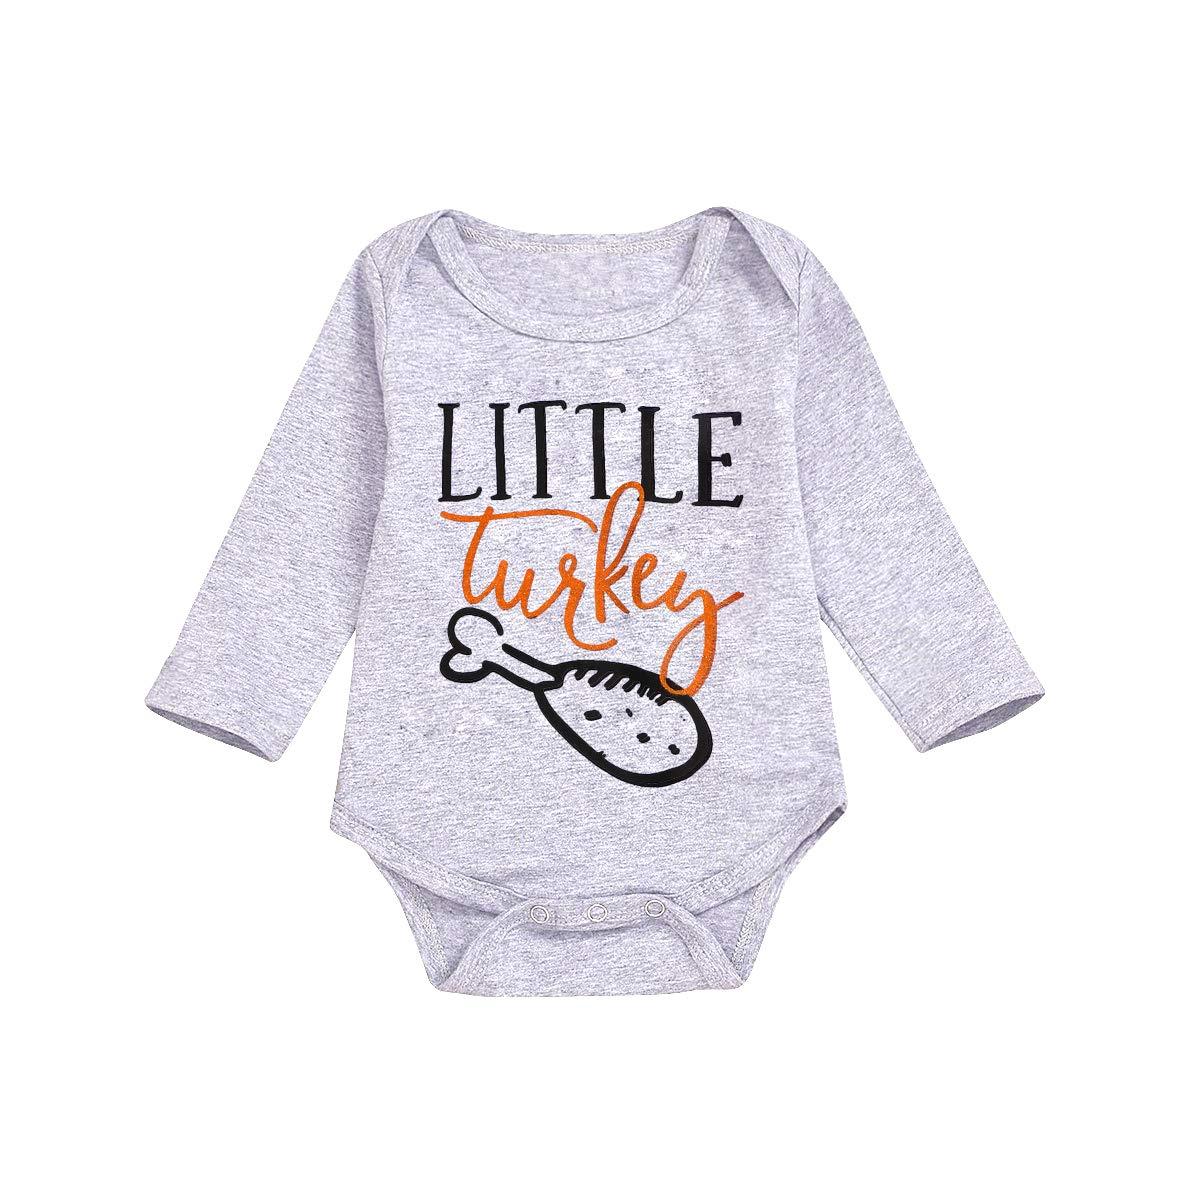 Boys Shirts for Kids Newborn Boys Girls Thanksgiving Outfit Little Turkey /& Big Turkey Matching Clothes